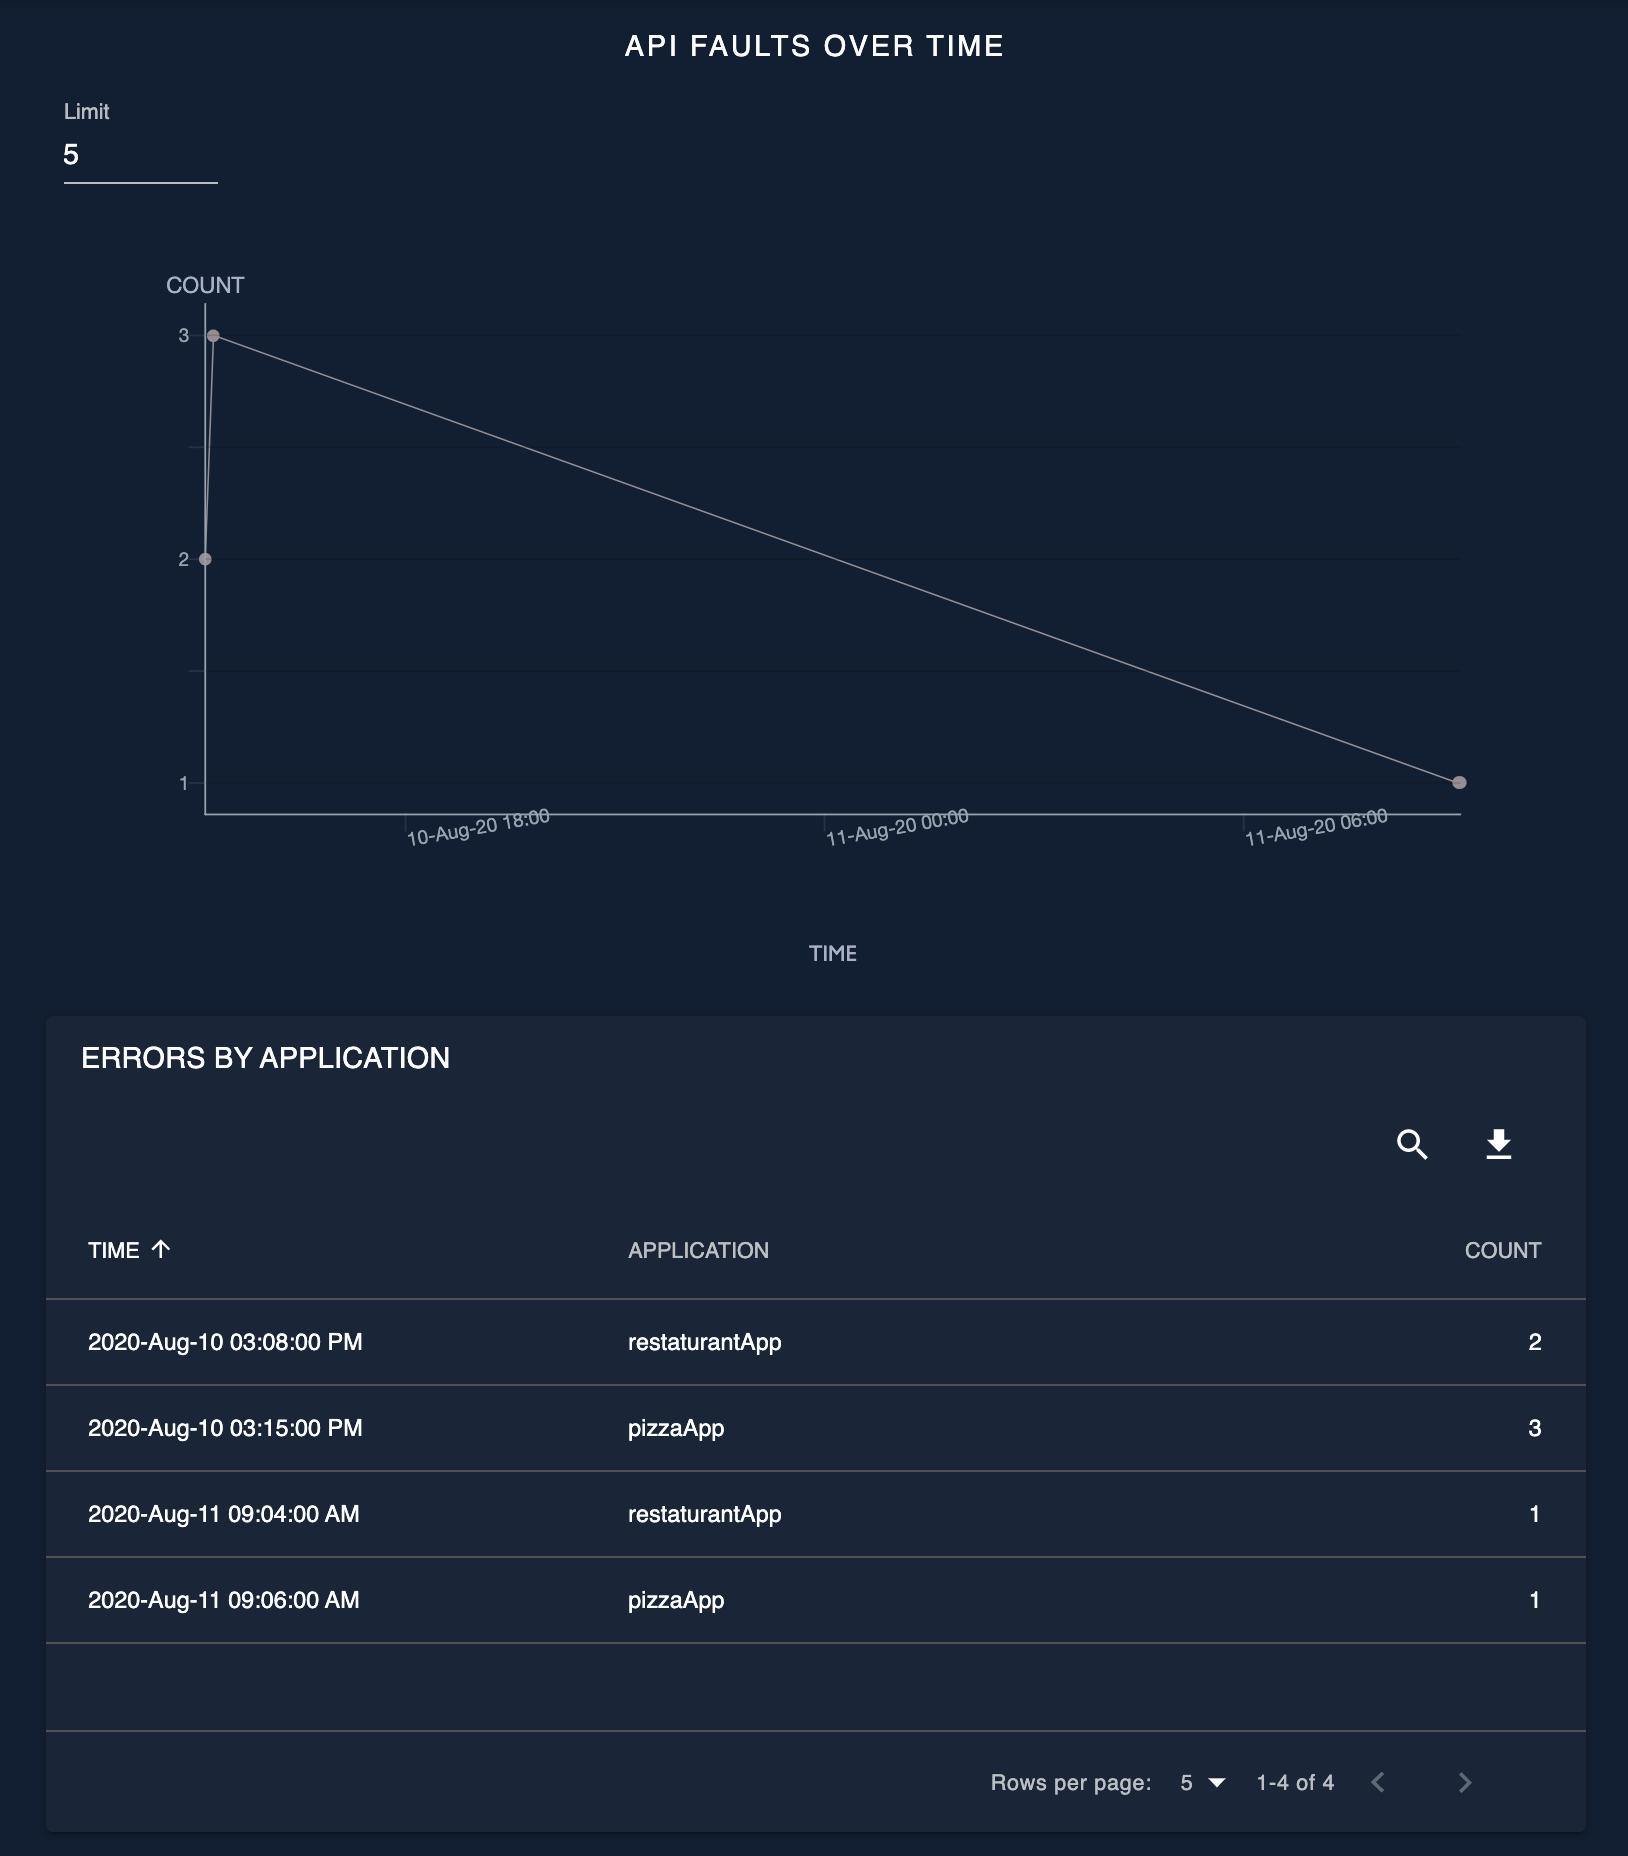 API faults over time